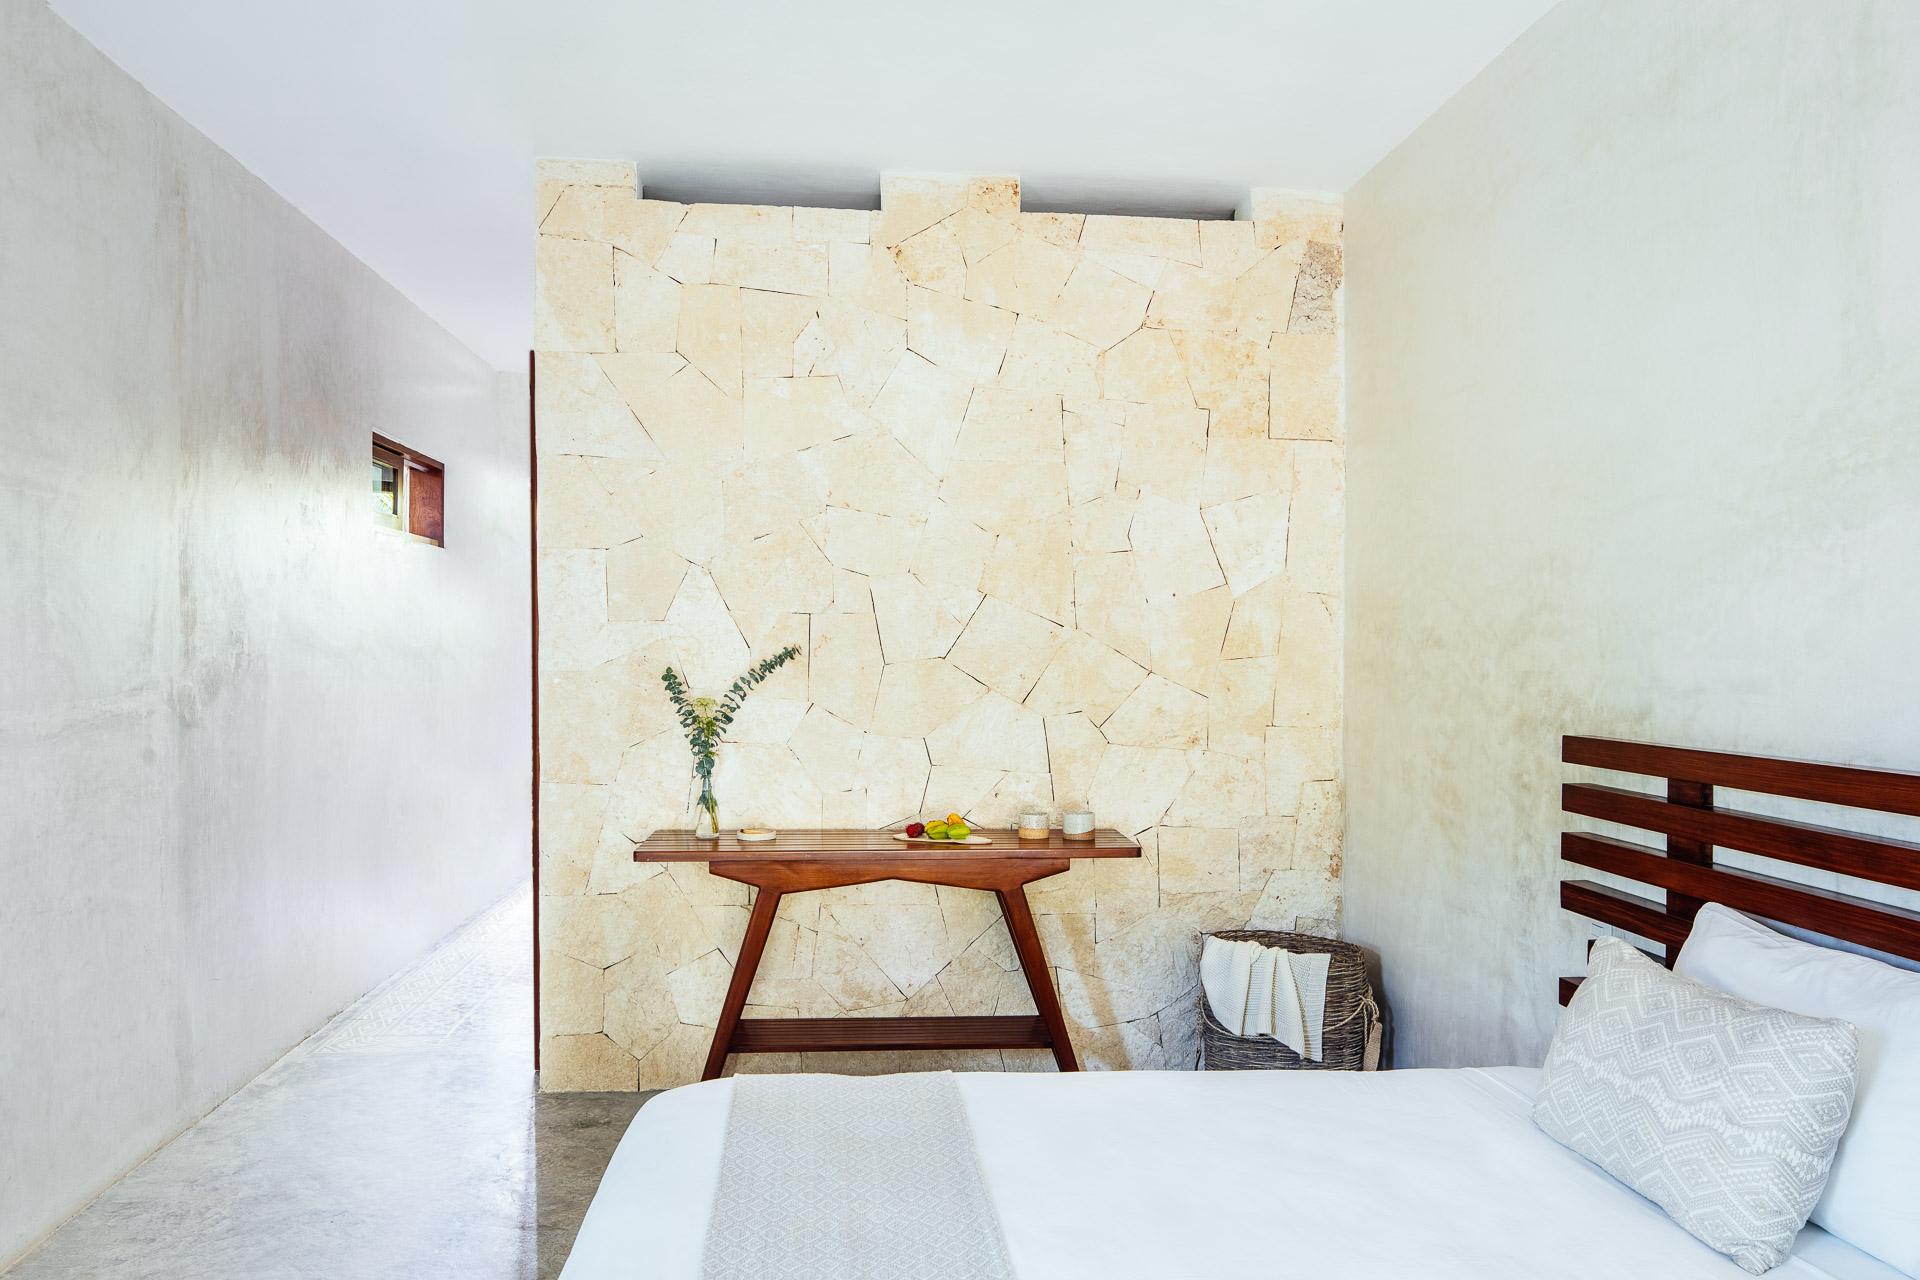 caribbean-hotel-resort-photographer-olas-tulum-mexico--5.jpg